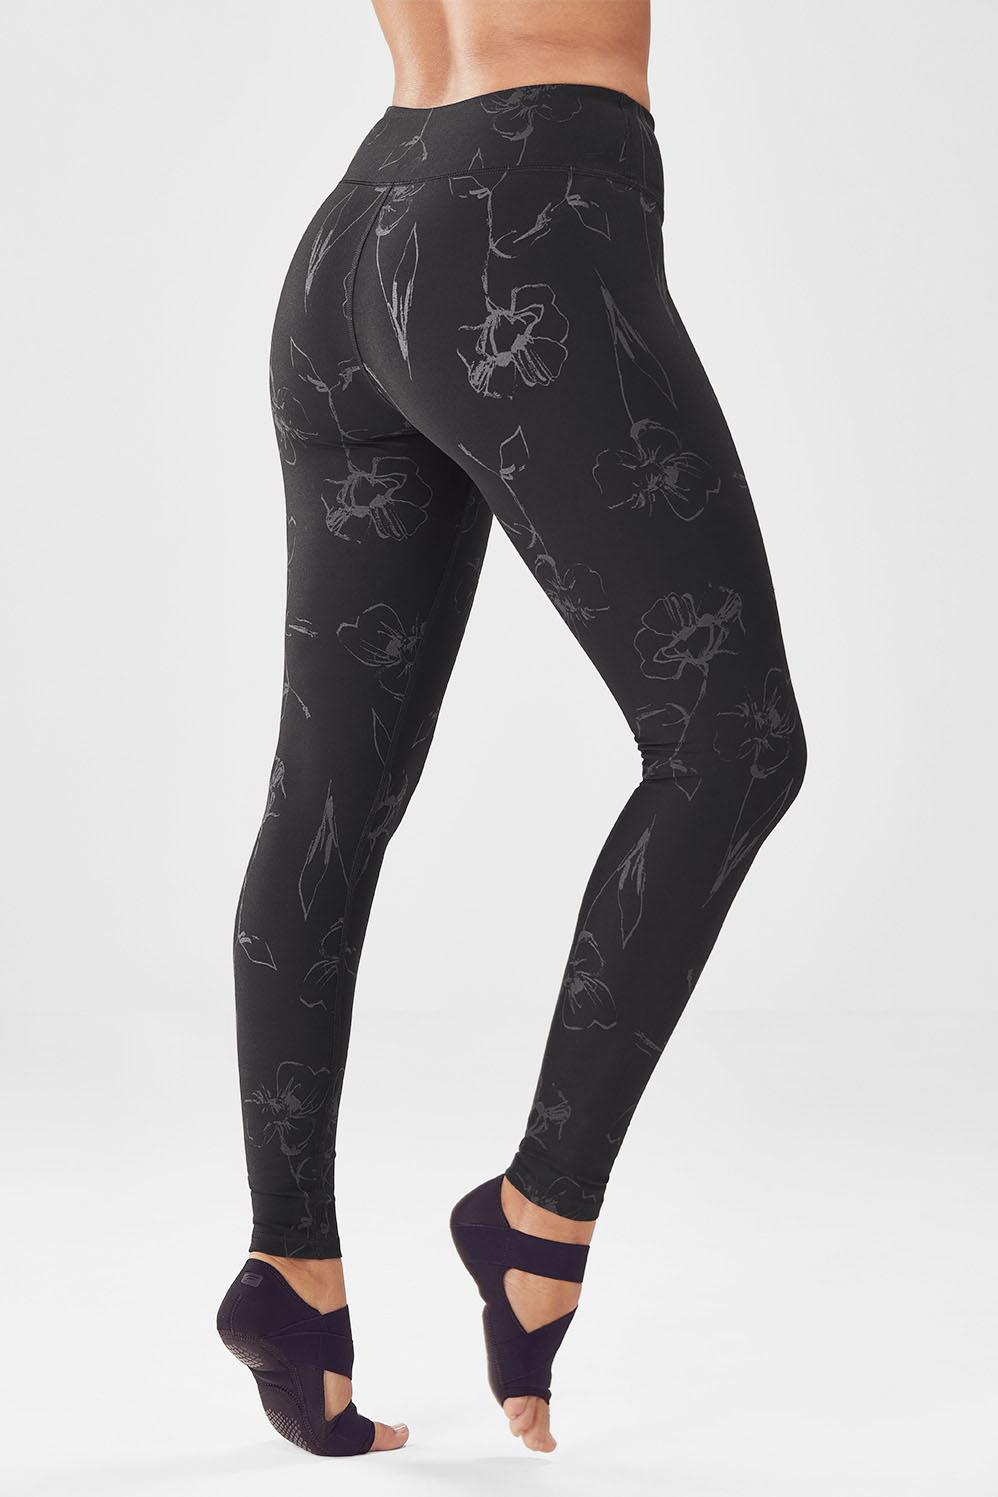 8f5bf7c56aa Salar Printed PowerHold® Legging - versilia clear print